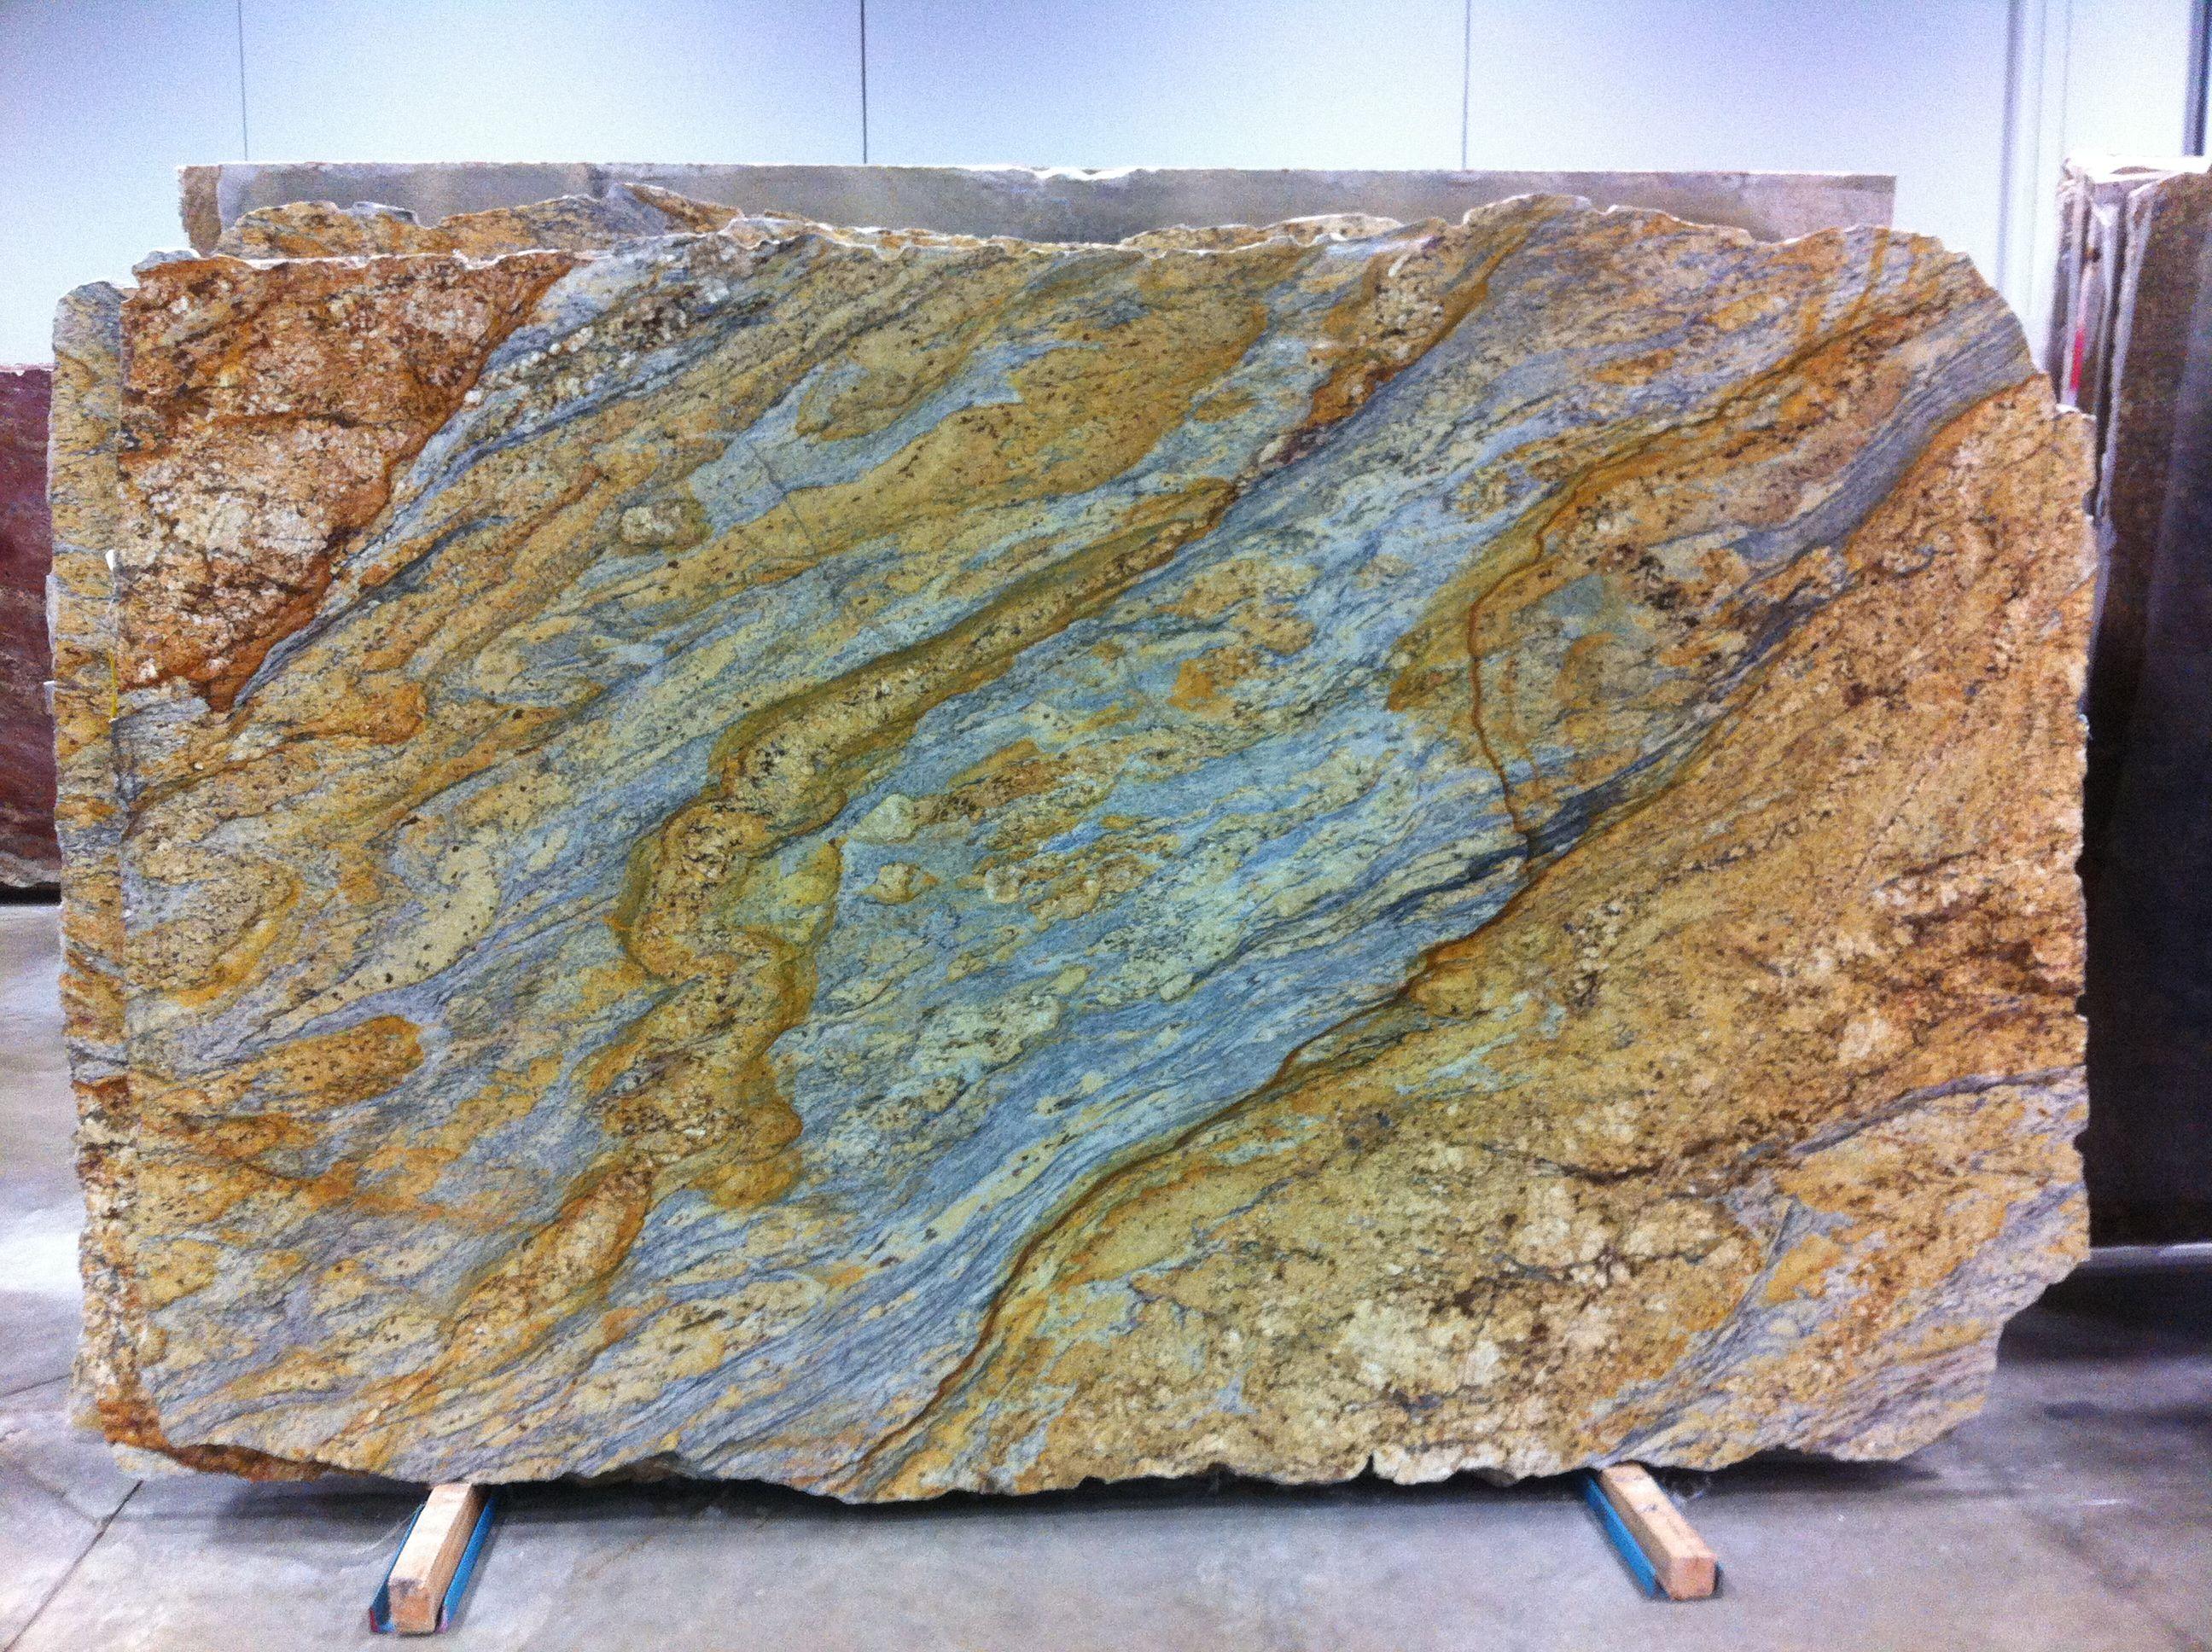 Yellow River Granite The Slabs We Picked Outdoor Kitchen Design Countertops Outdoor Kitchen Countertops